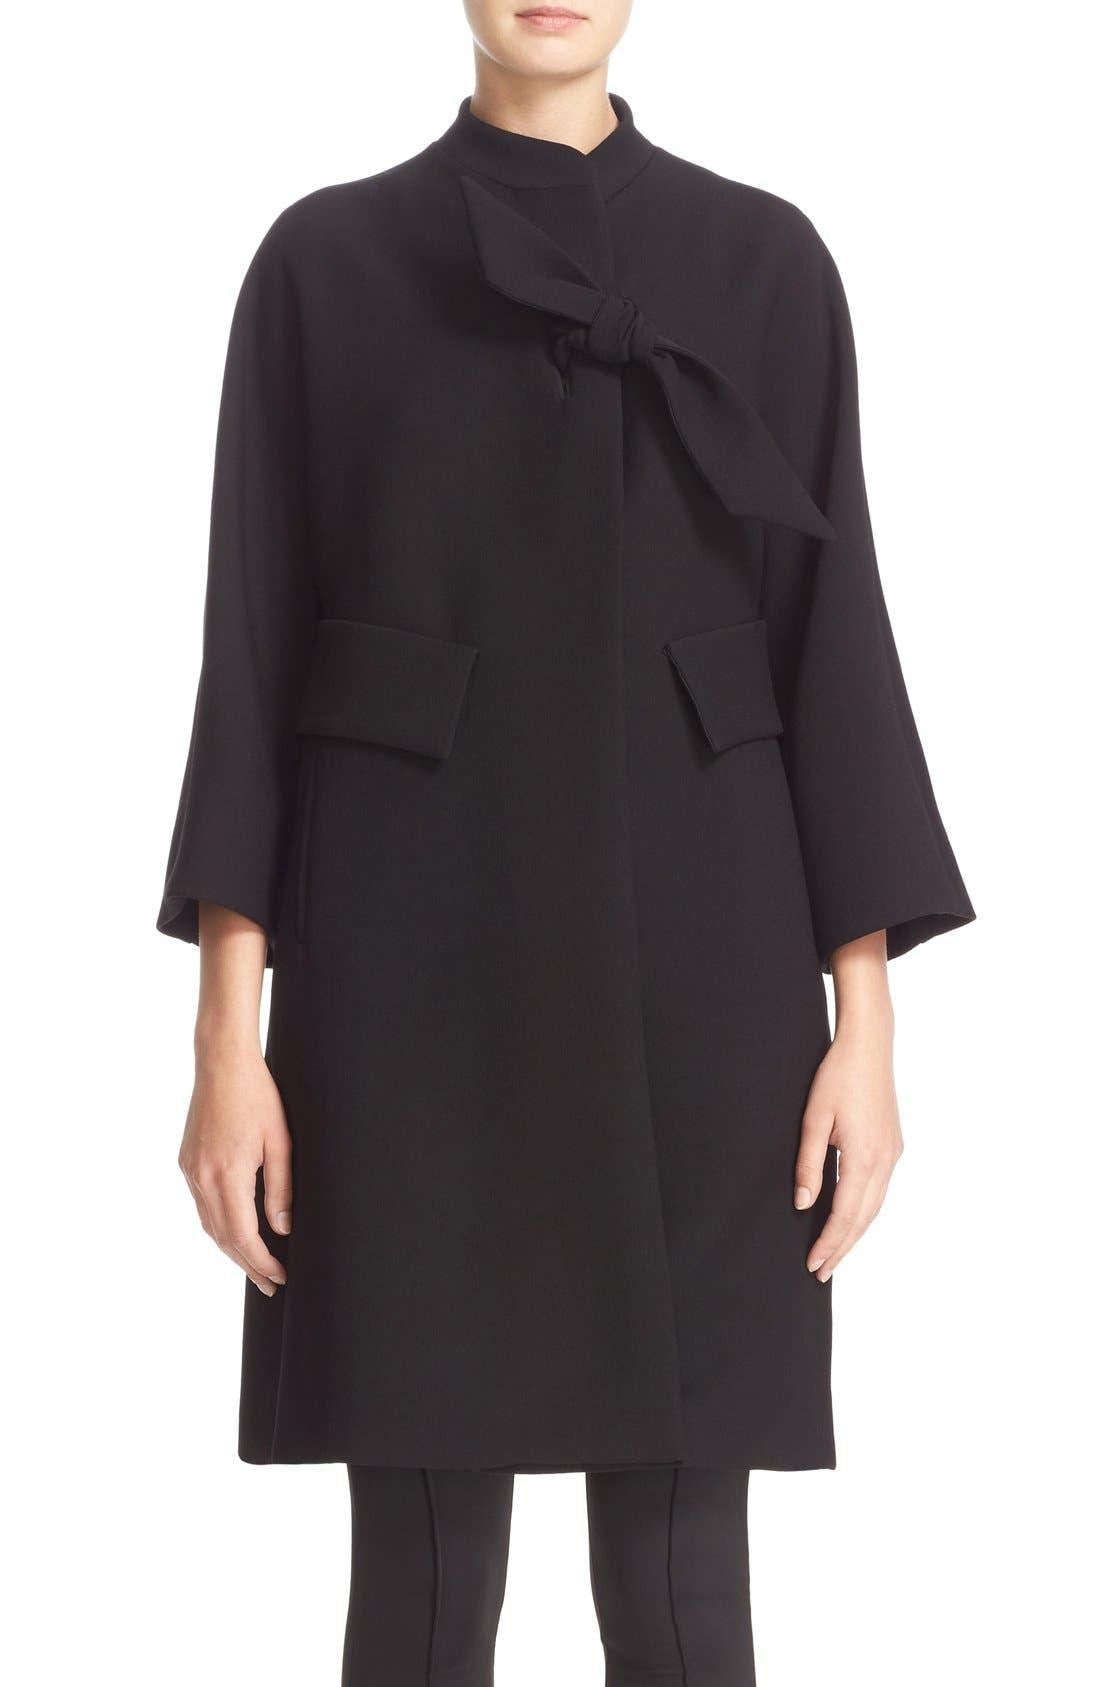 Main Image - Armani Collezioni Double Crepe Caban Jacket